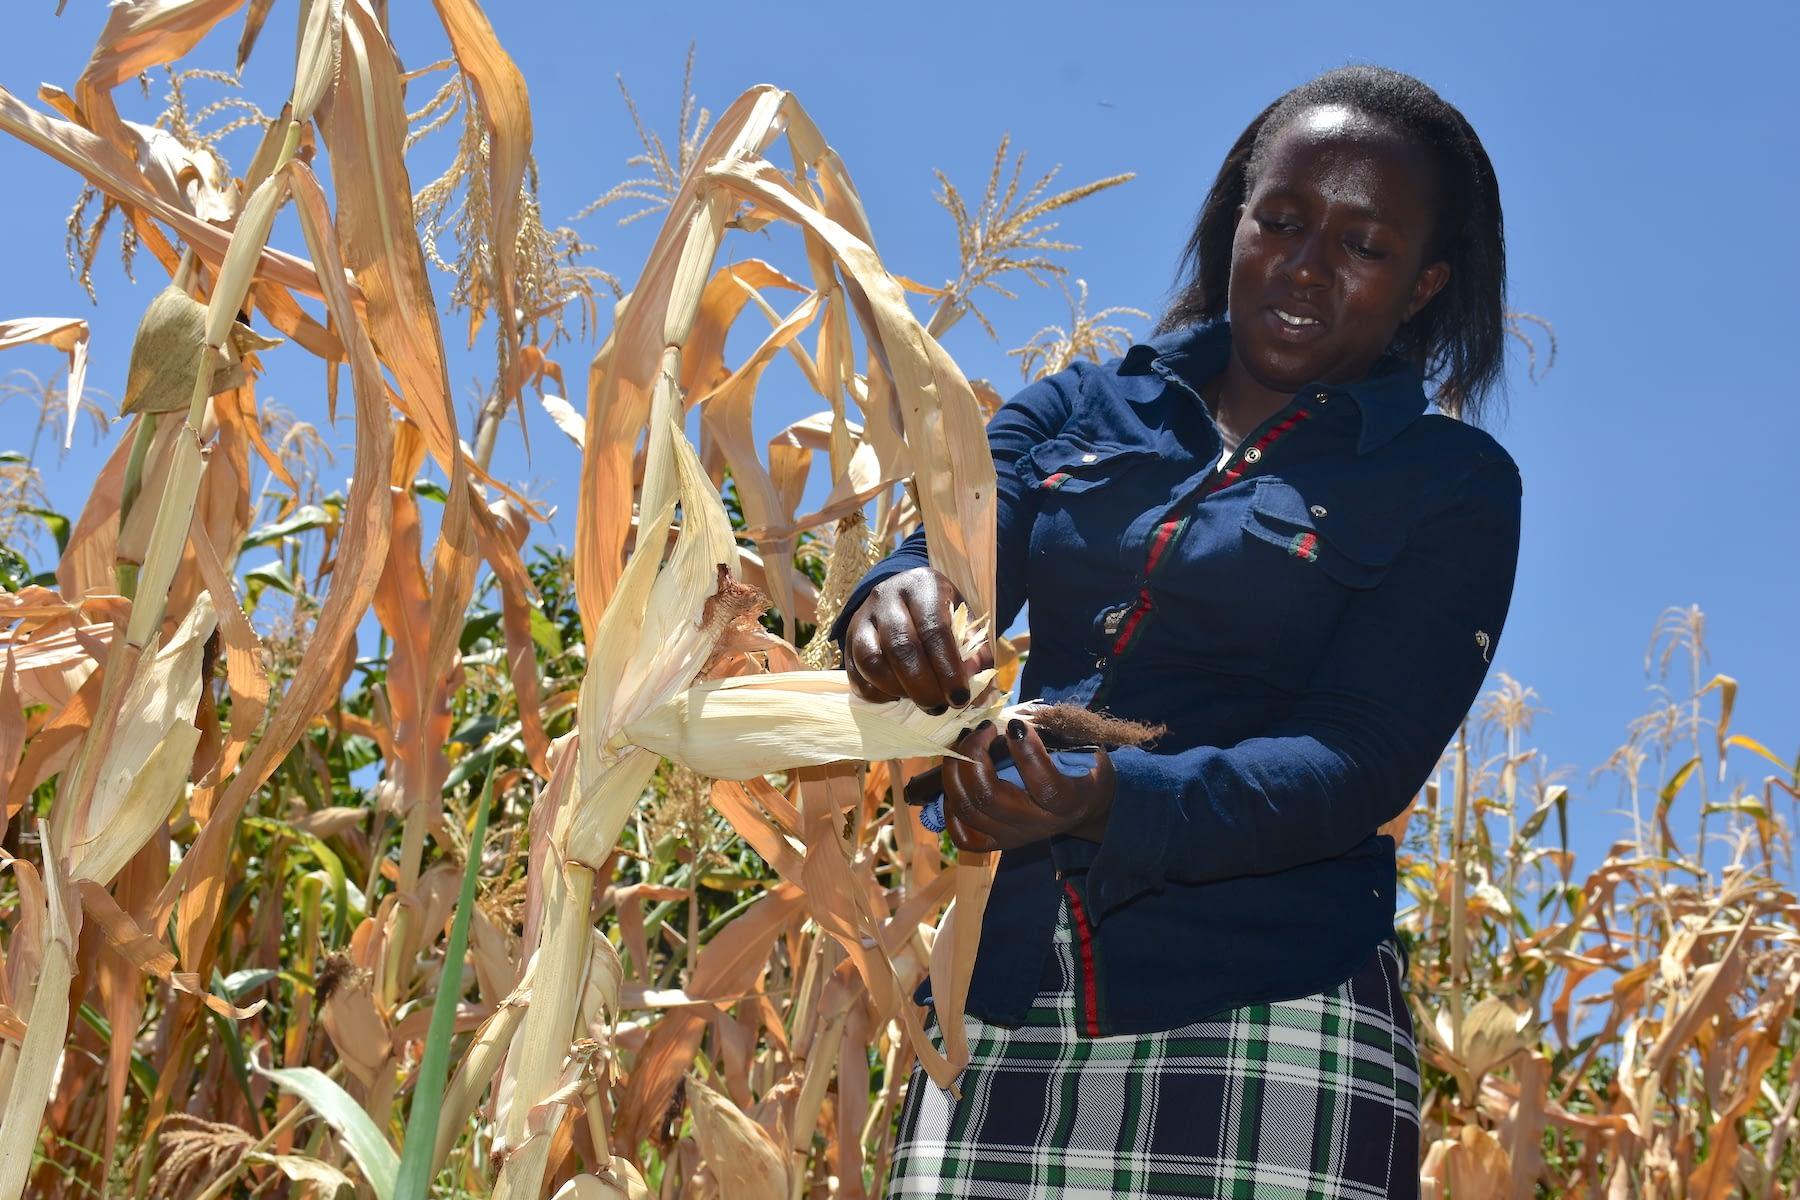 Tabitha Kamau checks the maize at her family's farm in Machakos County, Kenya. (Photo: Joshua Masinde/CIMMYT)